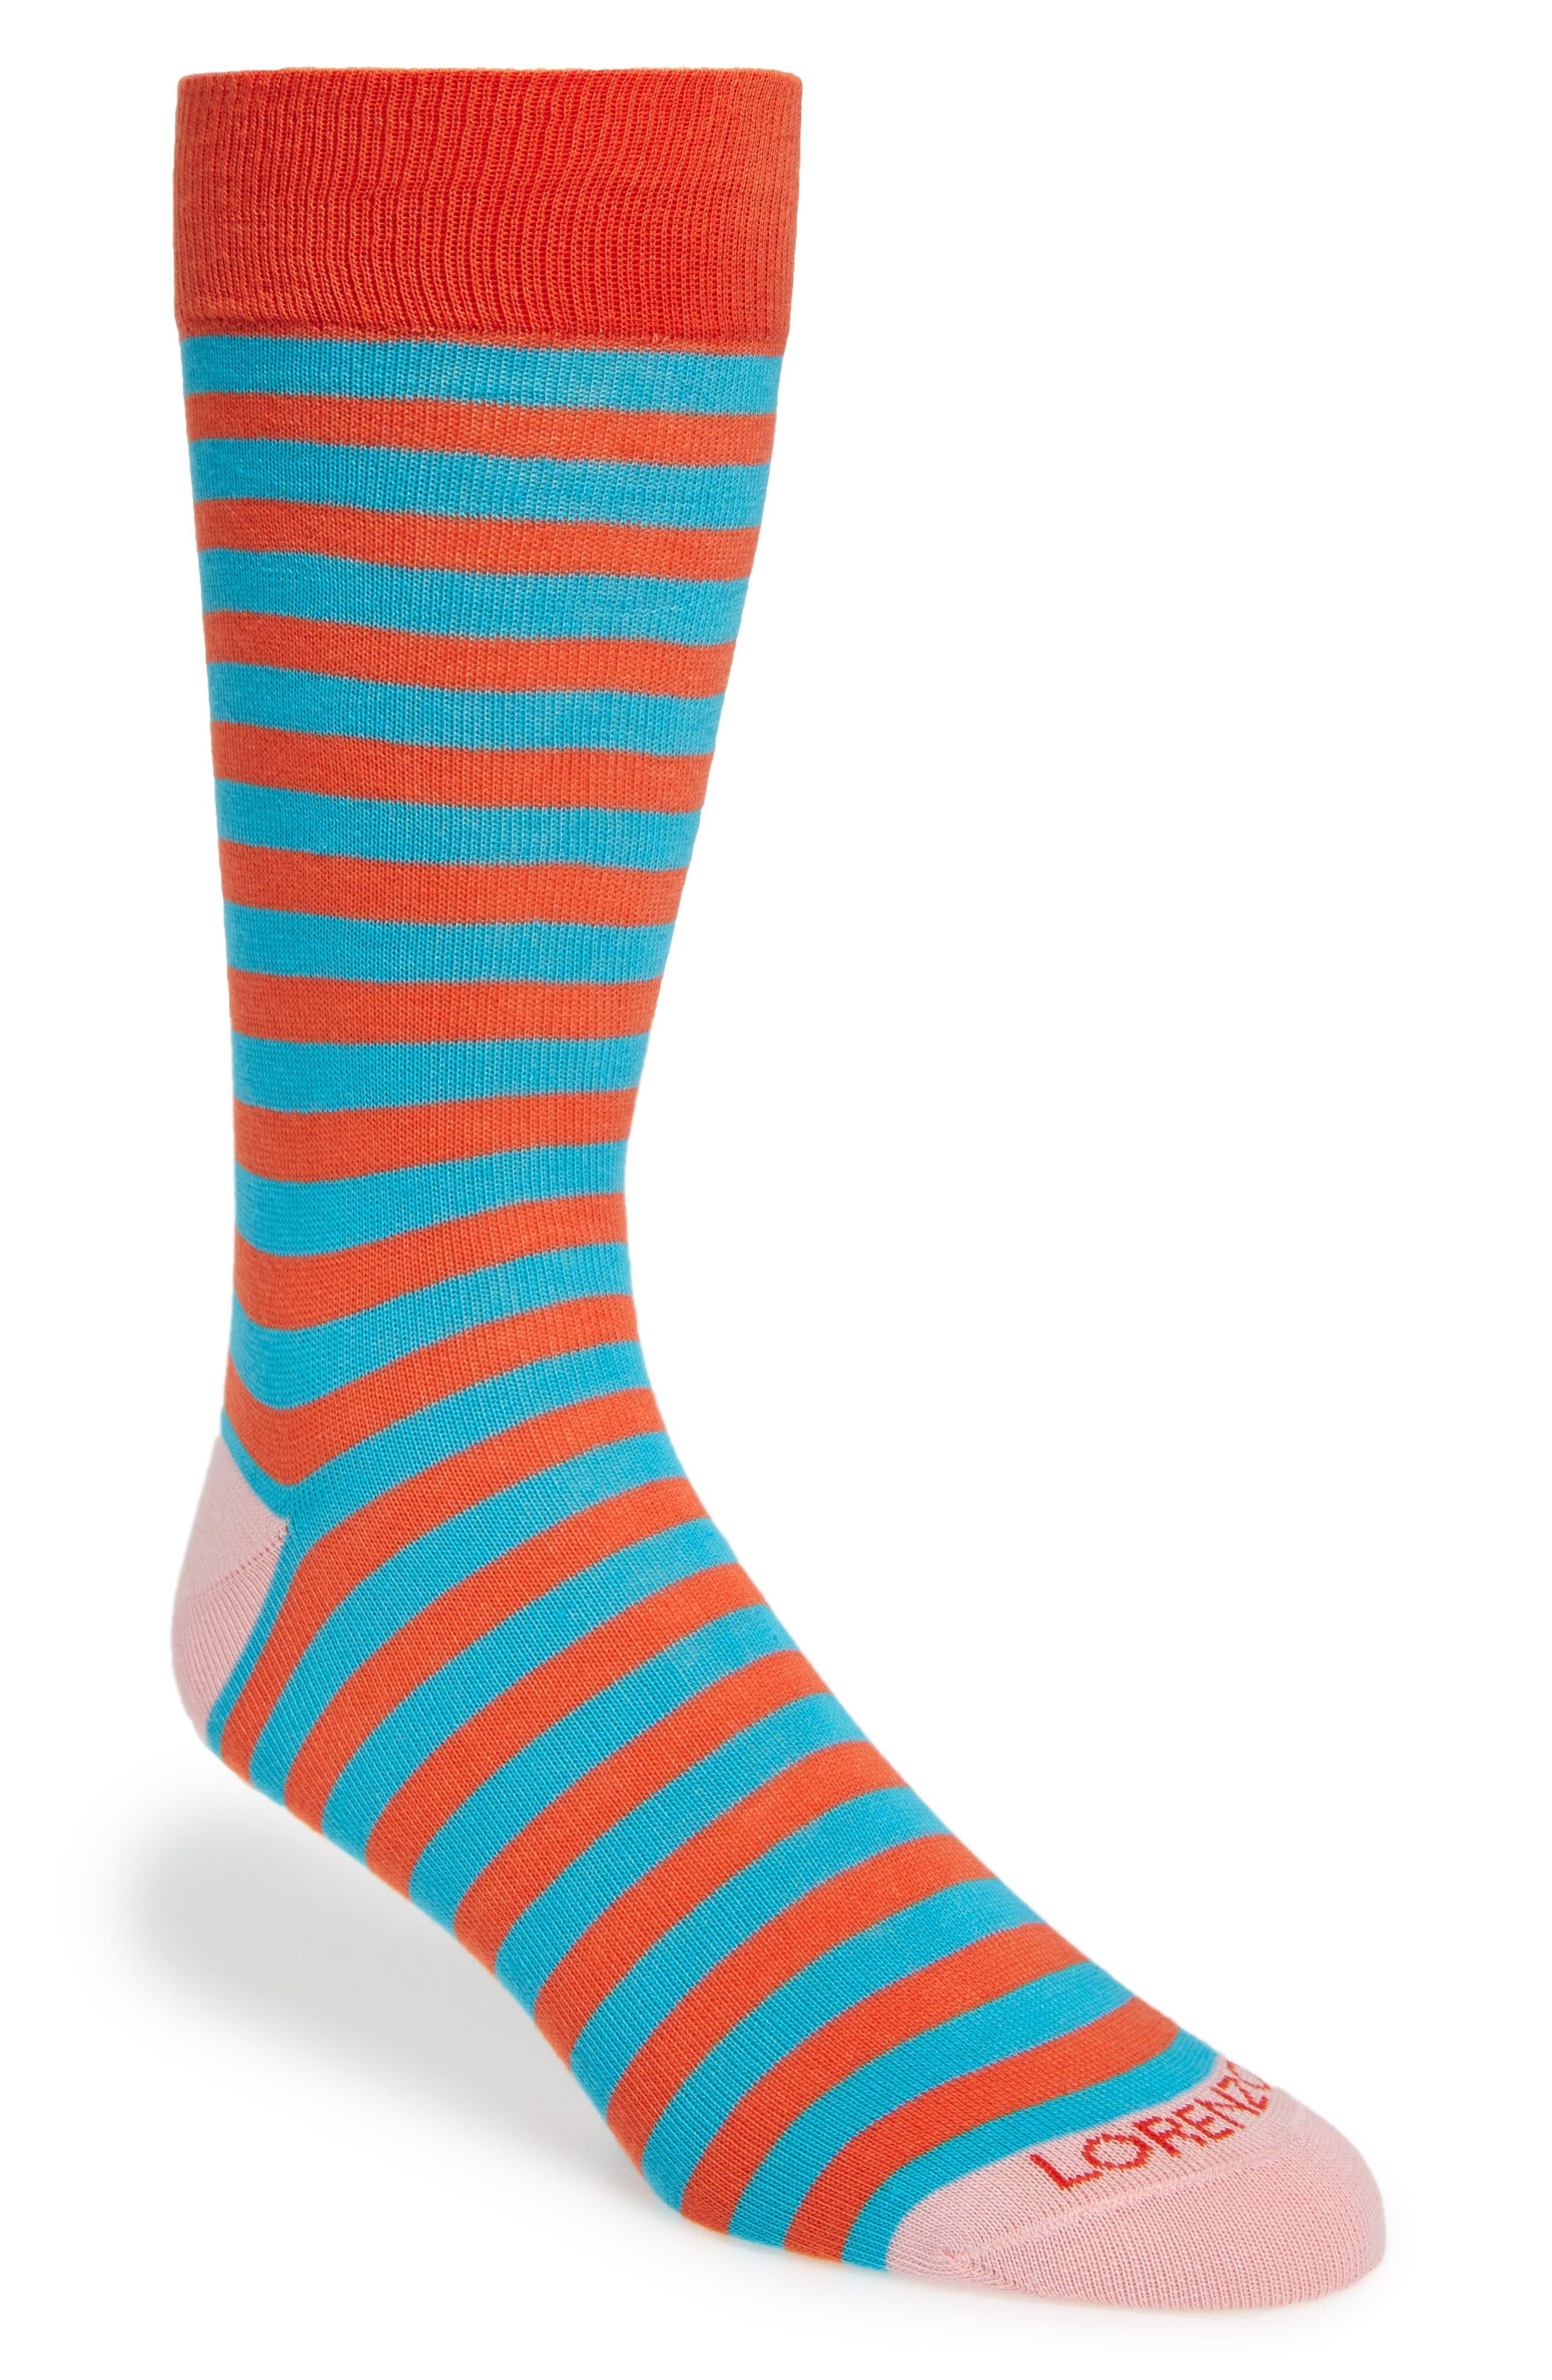 Lorenzo Uomo Stripe Socks